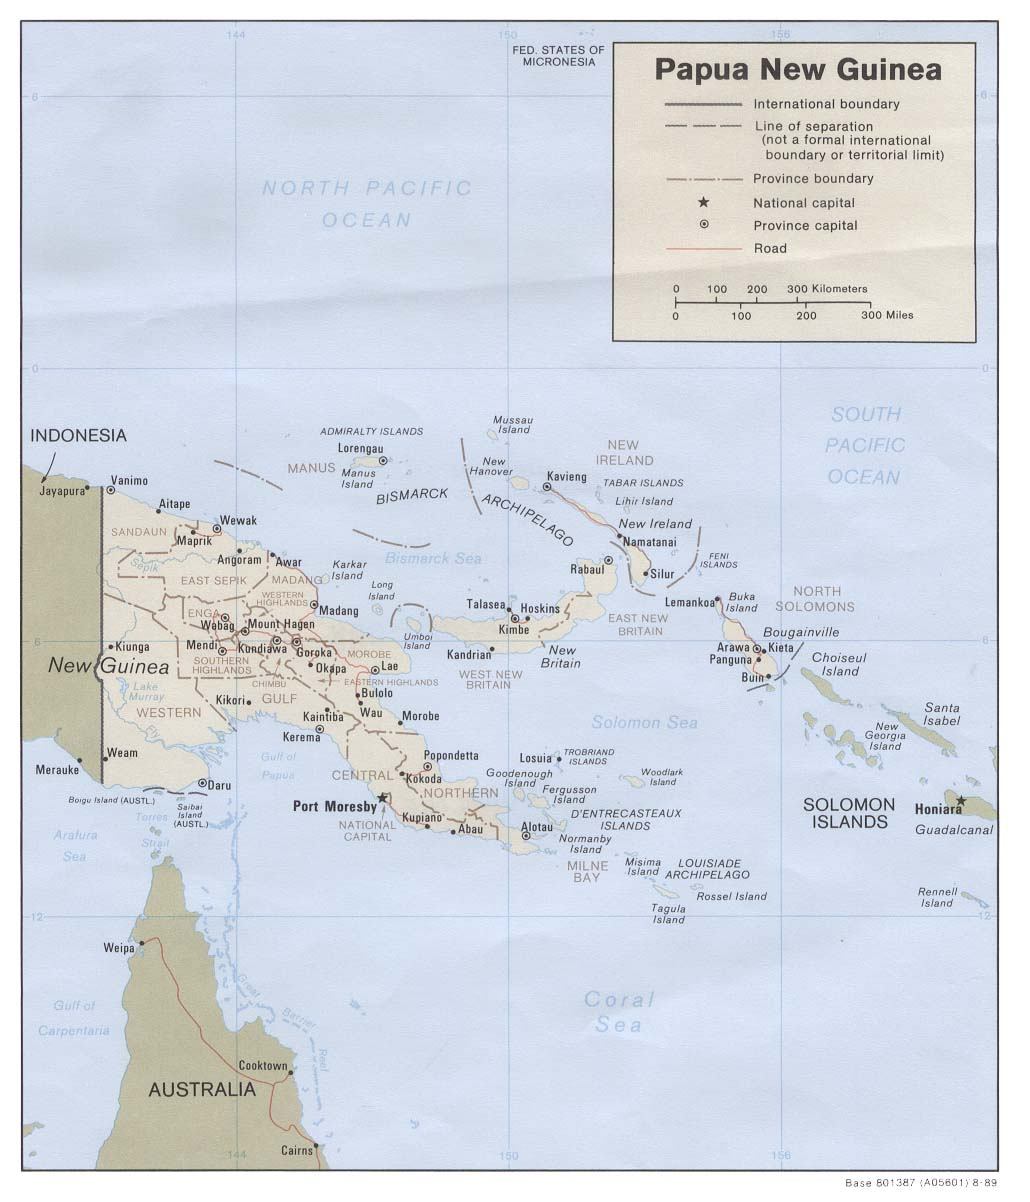 Papua New Guinea Maps PerryCastañeda Map Collection UT - Papua new guinea map